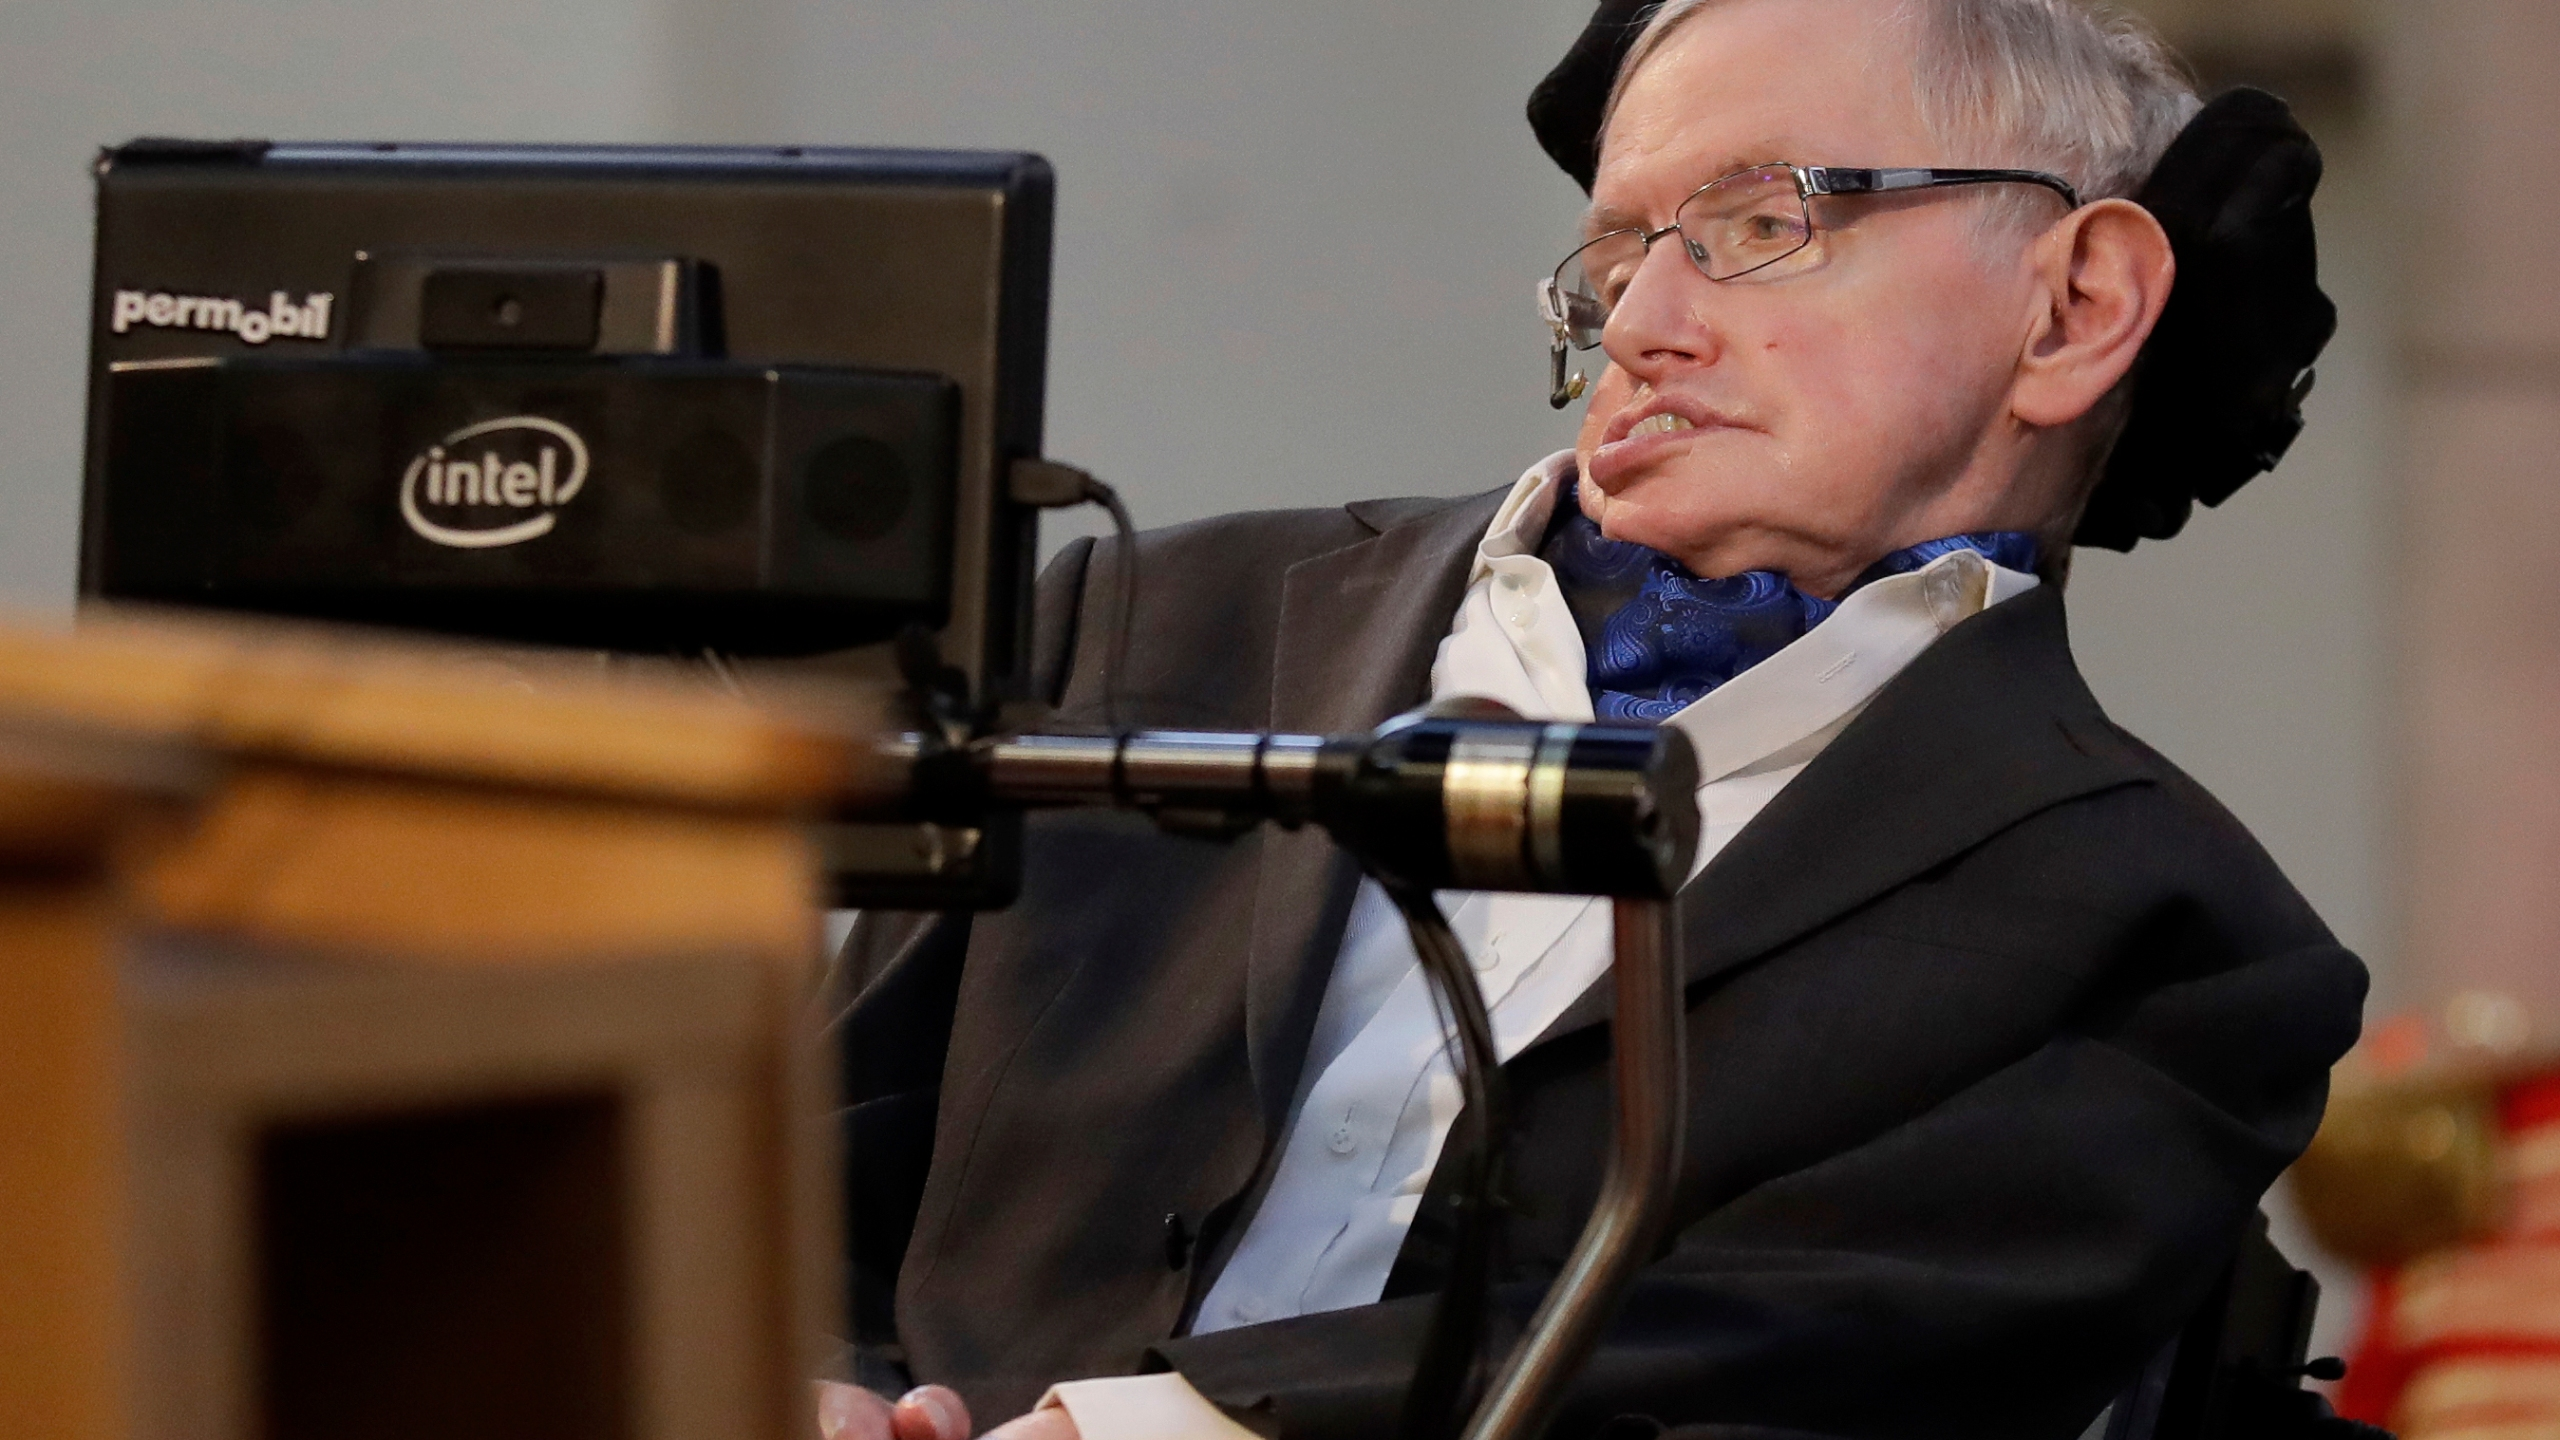 Obit_Stephen_Hawking_22948-159532.jpg55700407